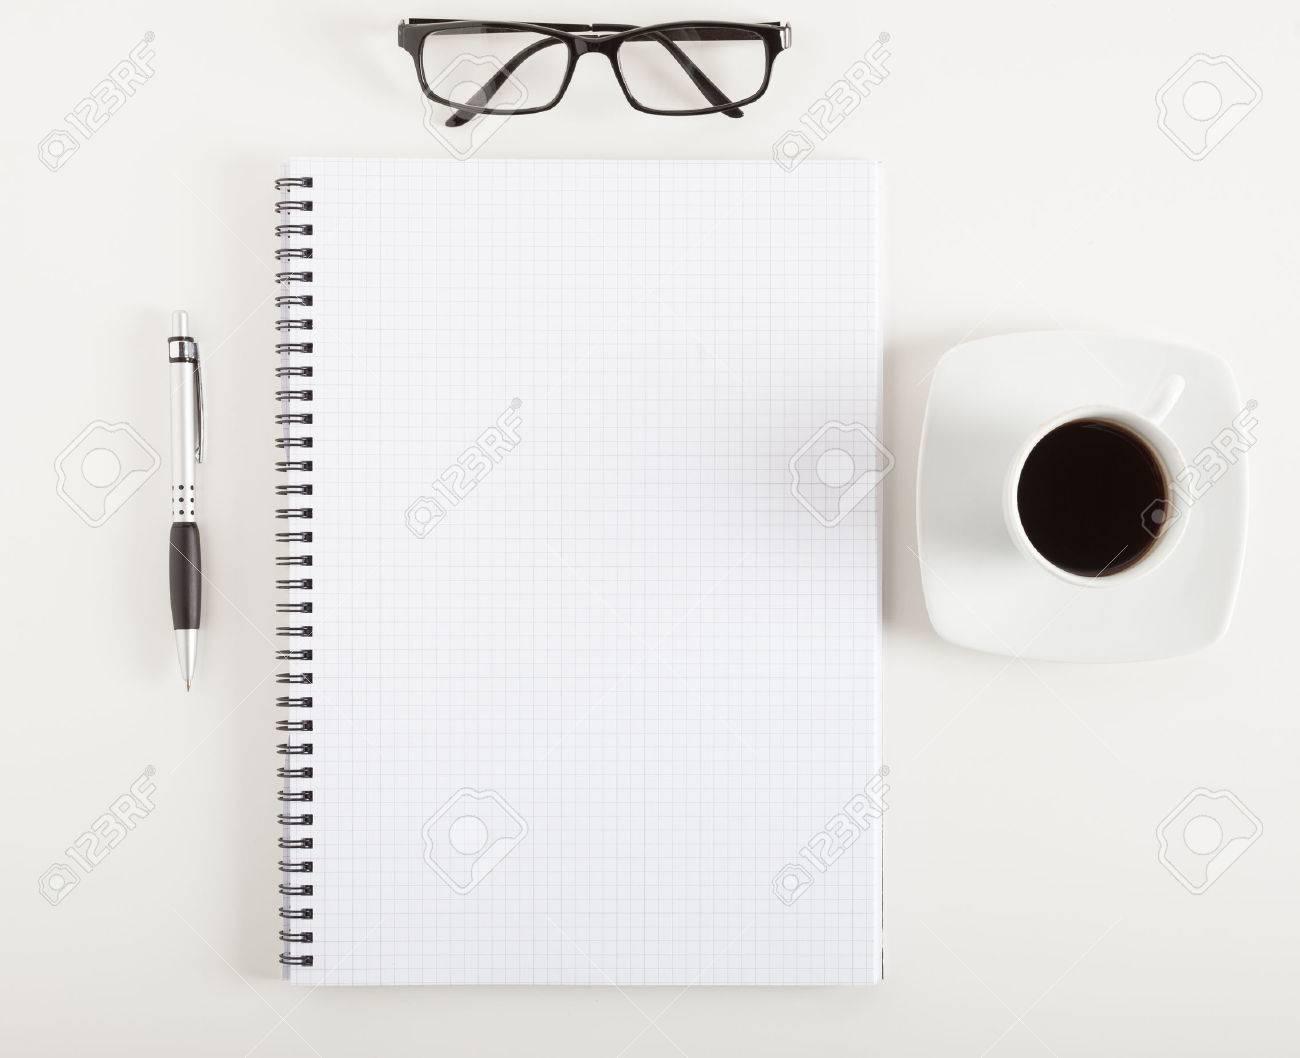 Empty notebook on a desk - 55326926